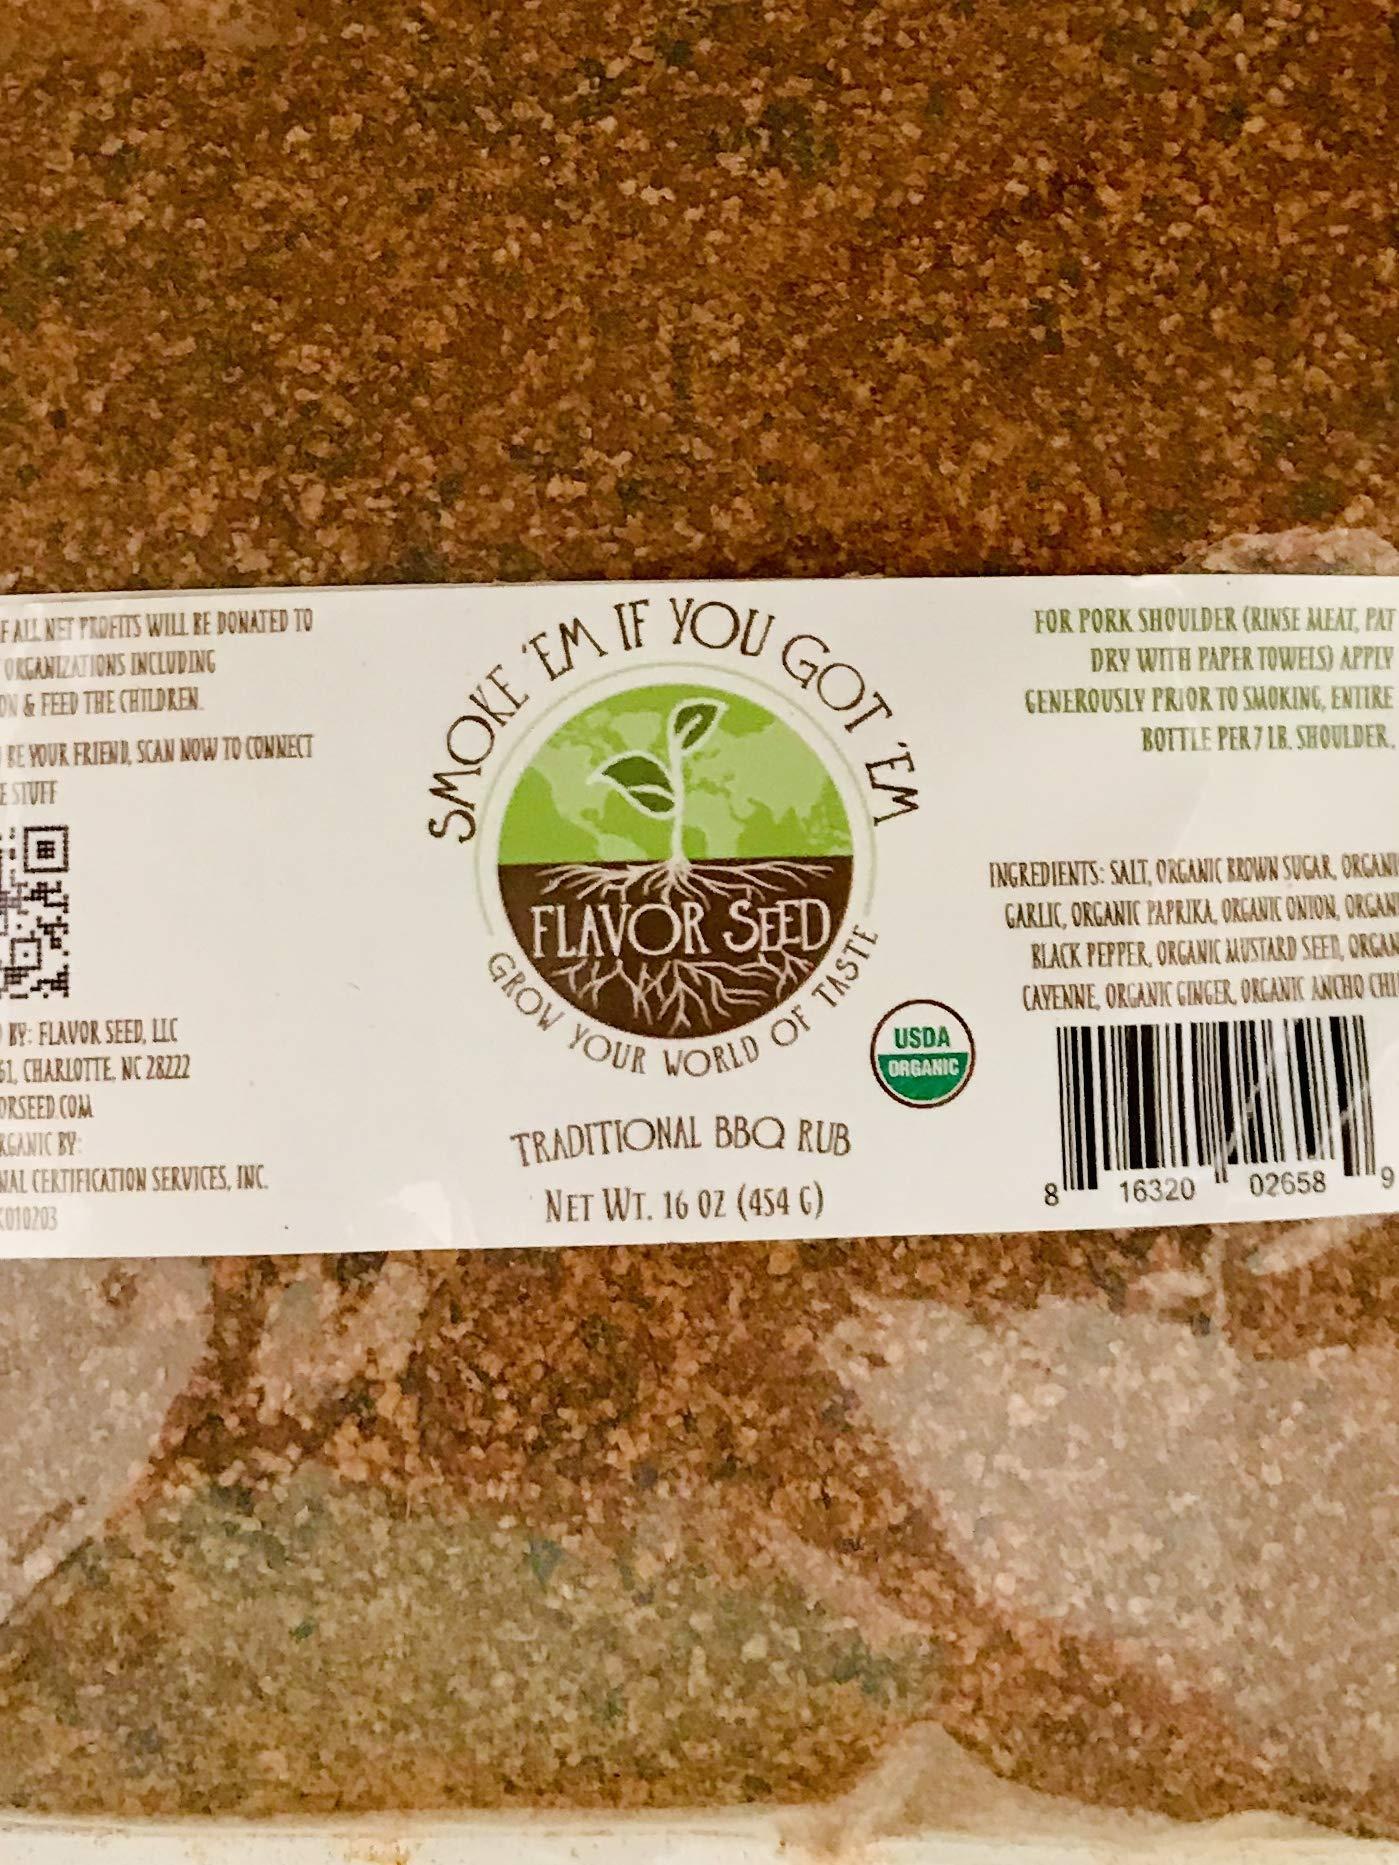 FLAVOR SEED - Smoke 'Em If You Got 'Em Organic BBQ Dry Rub|No BBQ Sauce Needed|Keto, Paleo, Non-GMO, Gluten Free|Pork, Beef, Barbecue, Ribs, Burgers, Fries, Pork Rinds, Chicken, Vegetables, Beans